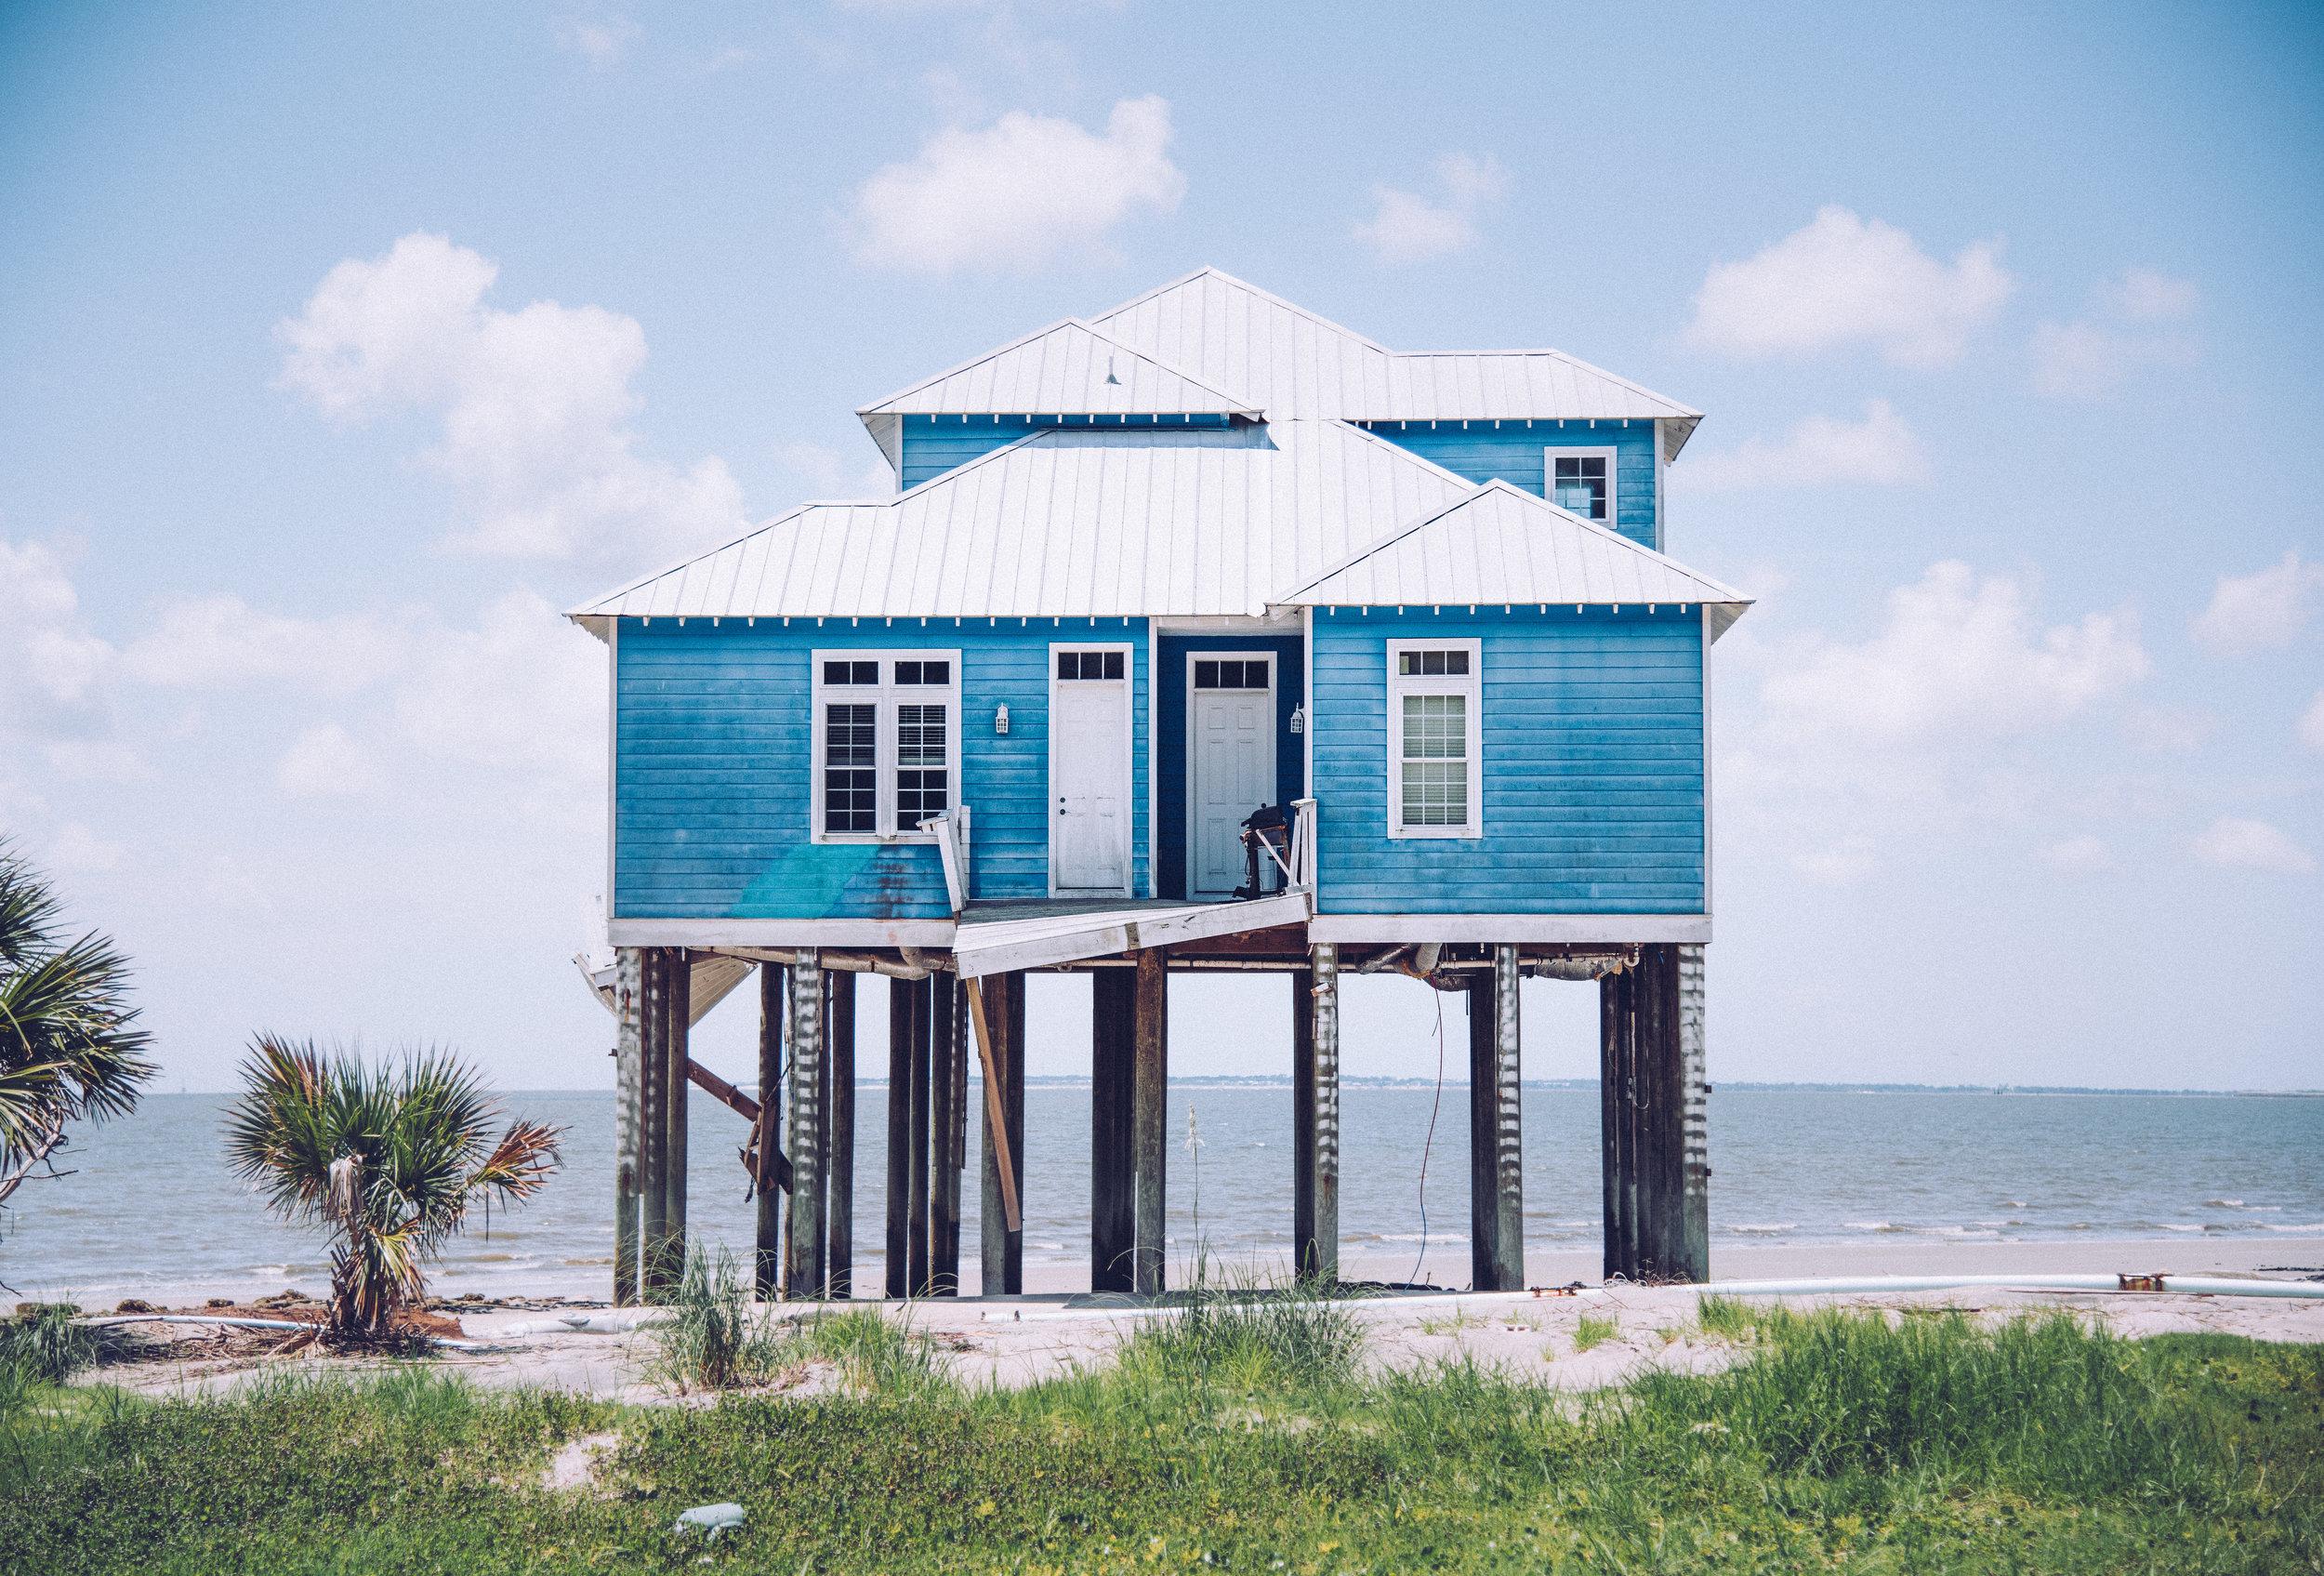 kw-abandoned-beachfront-homes-sc-img1.jpg